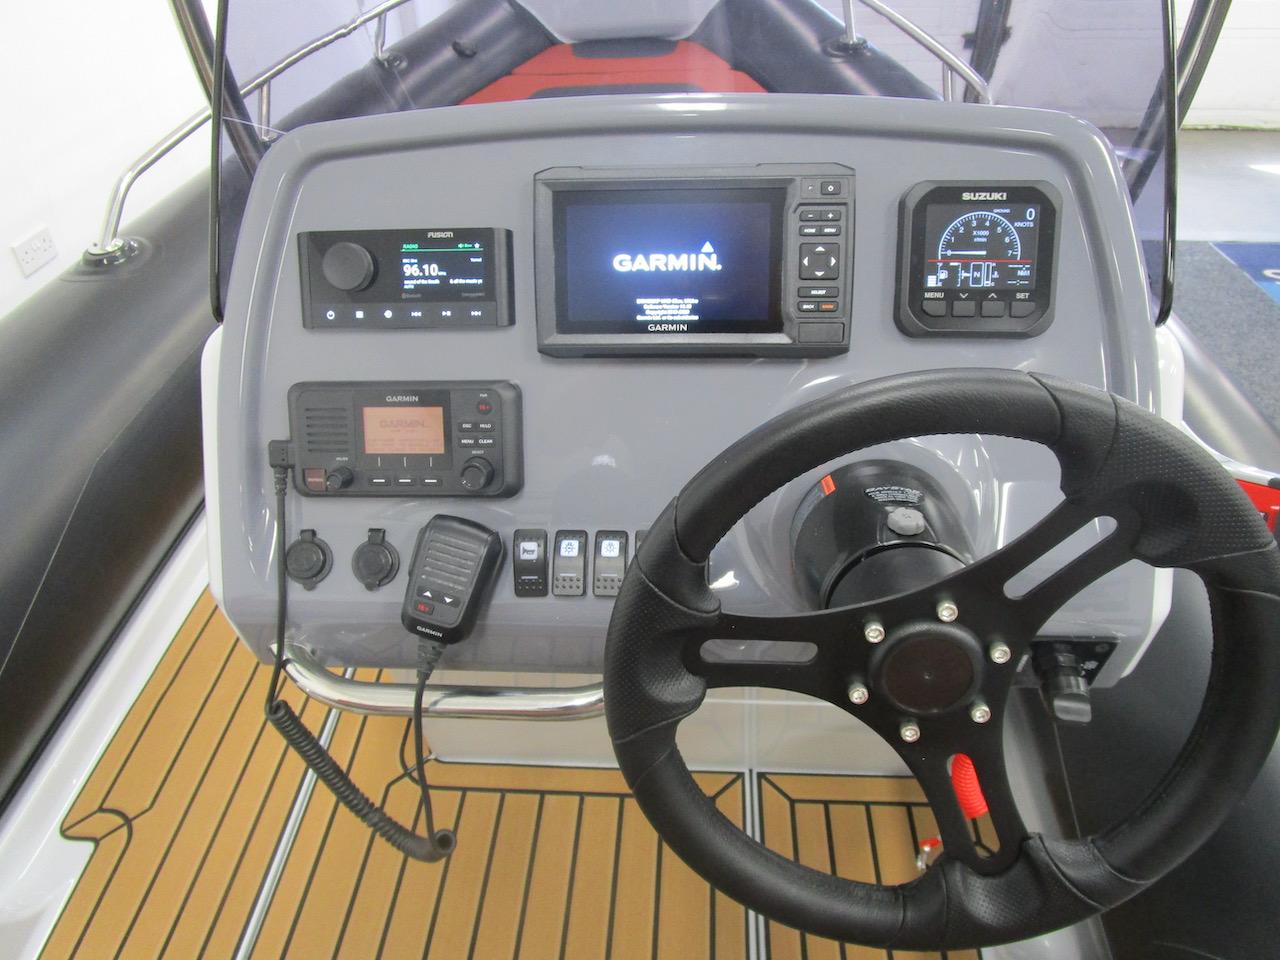 GRAND G500 RIB console and electronics